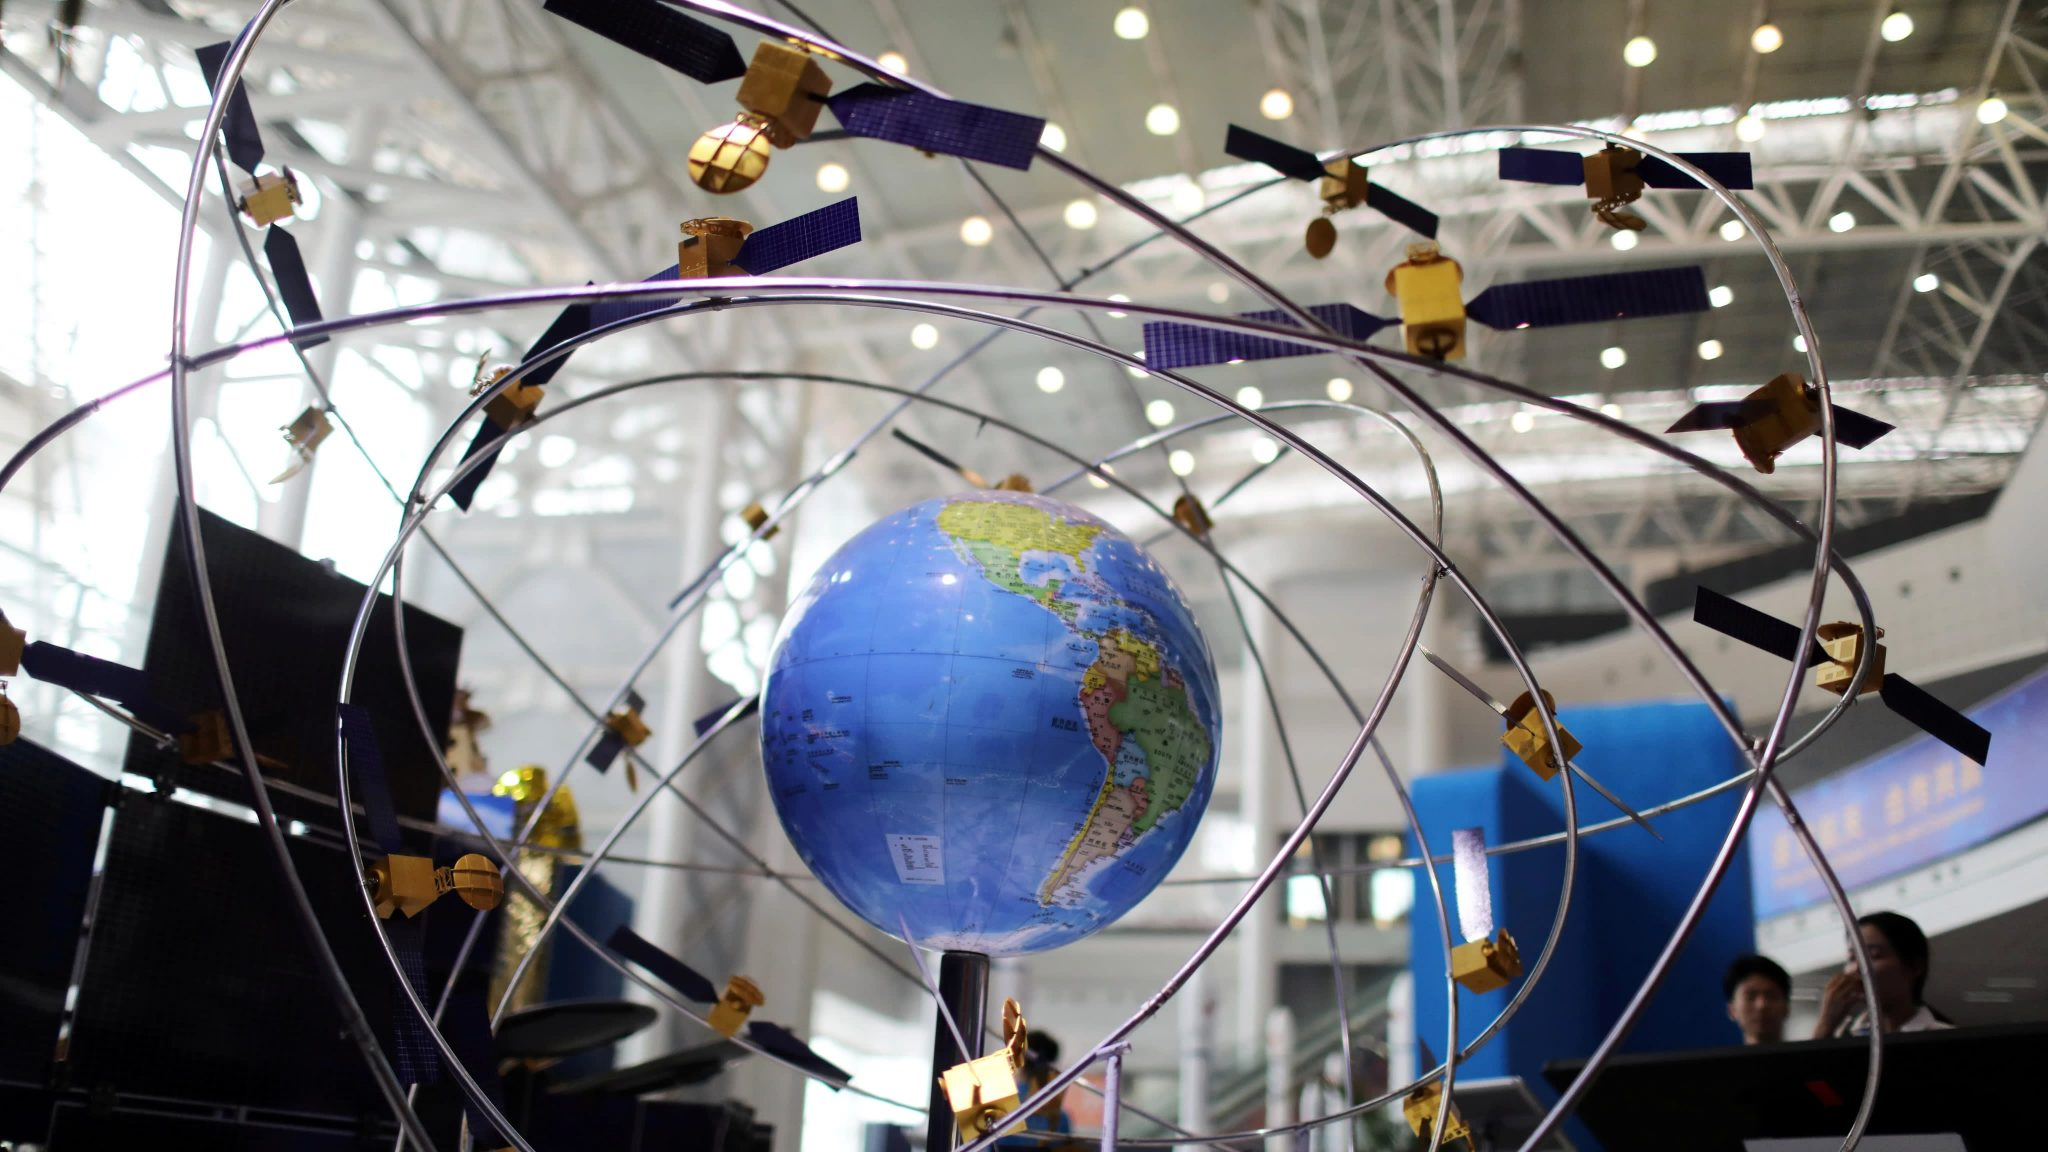 BeiDou چین از GPS آمریکا پیشی گرفت